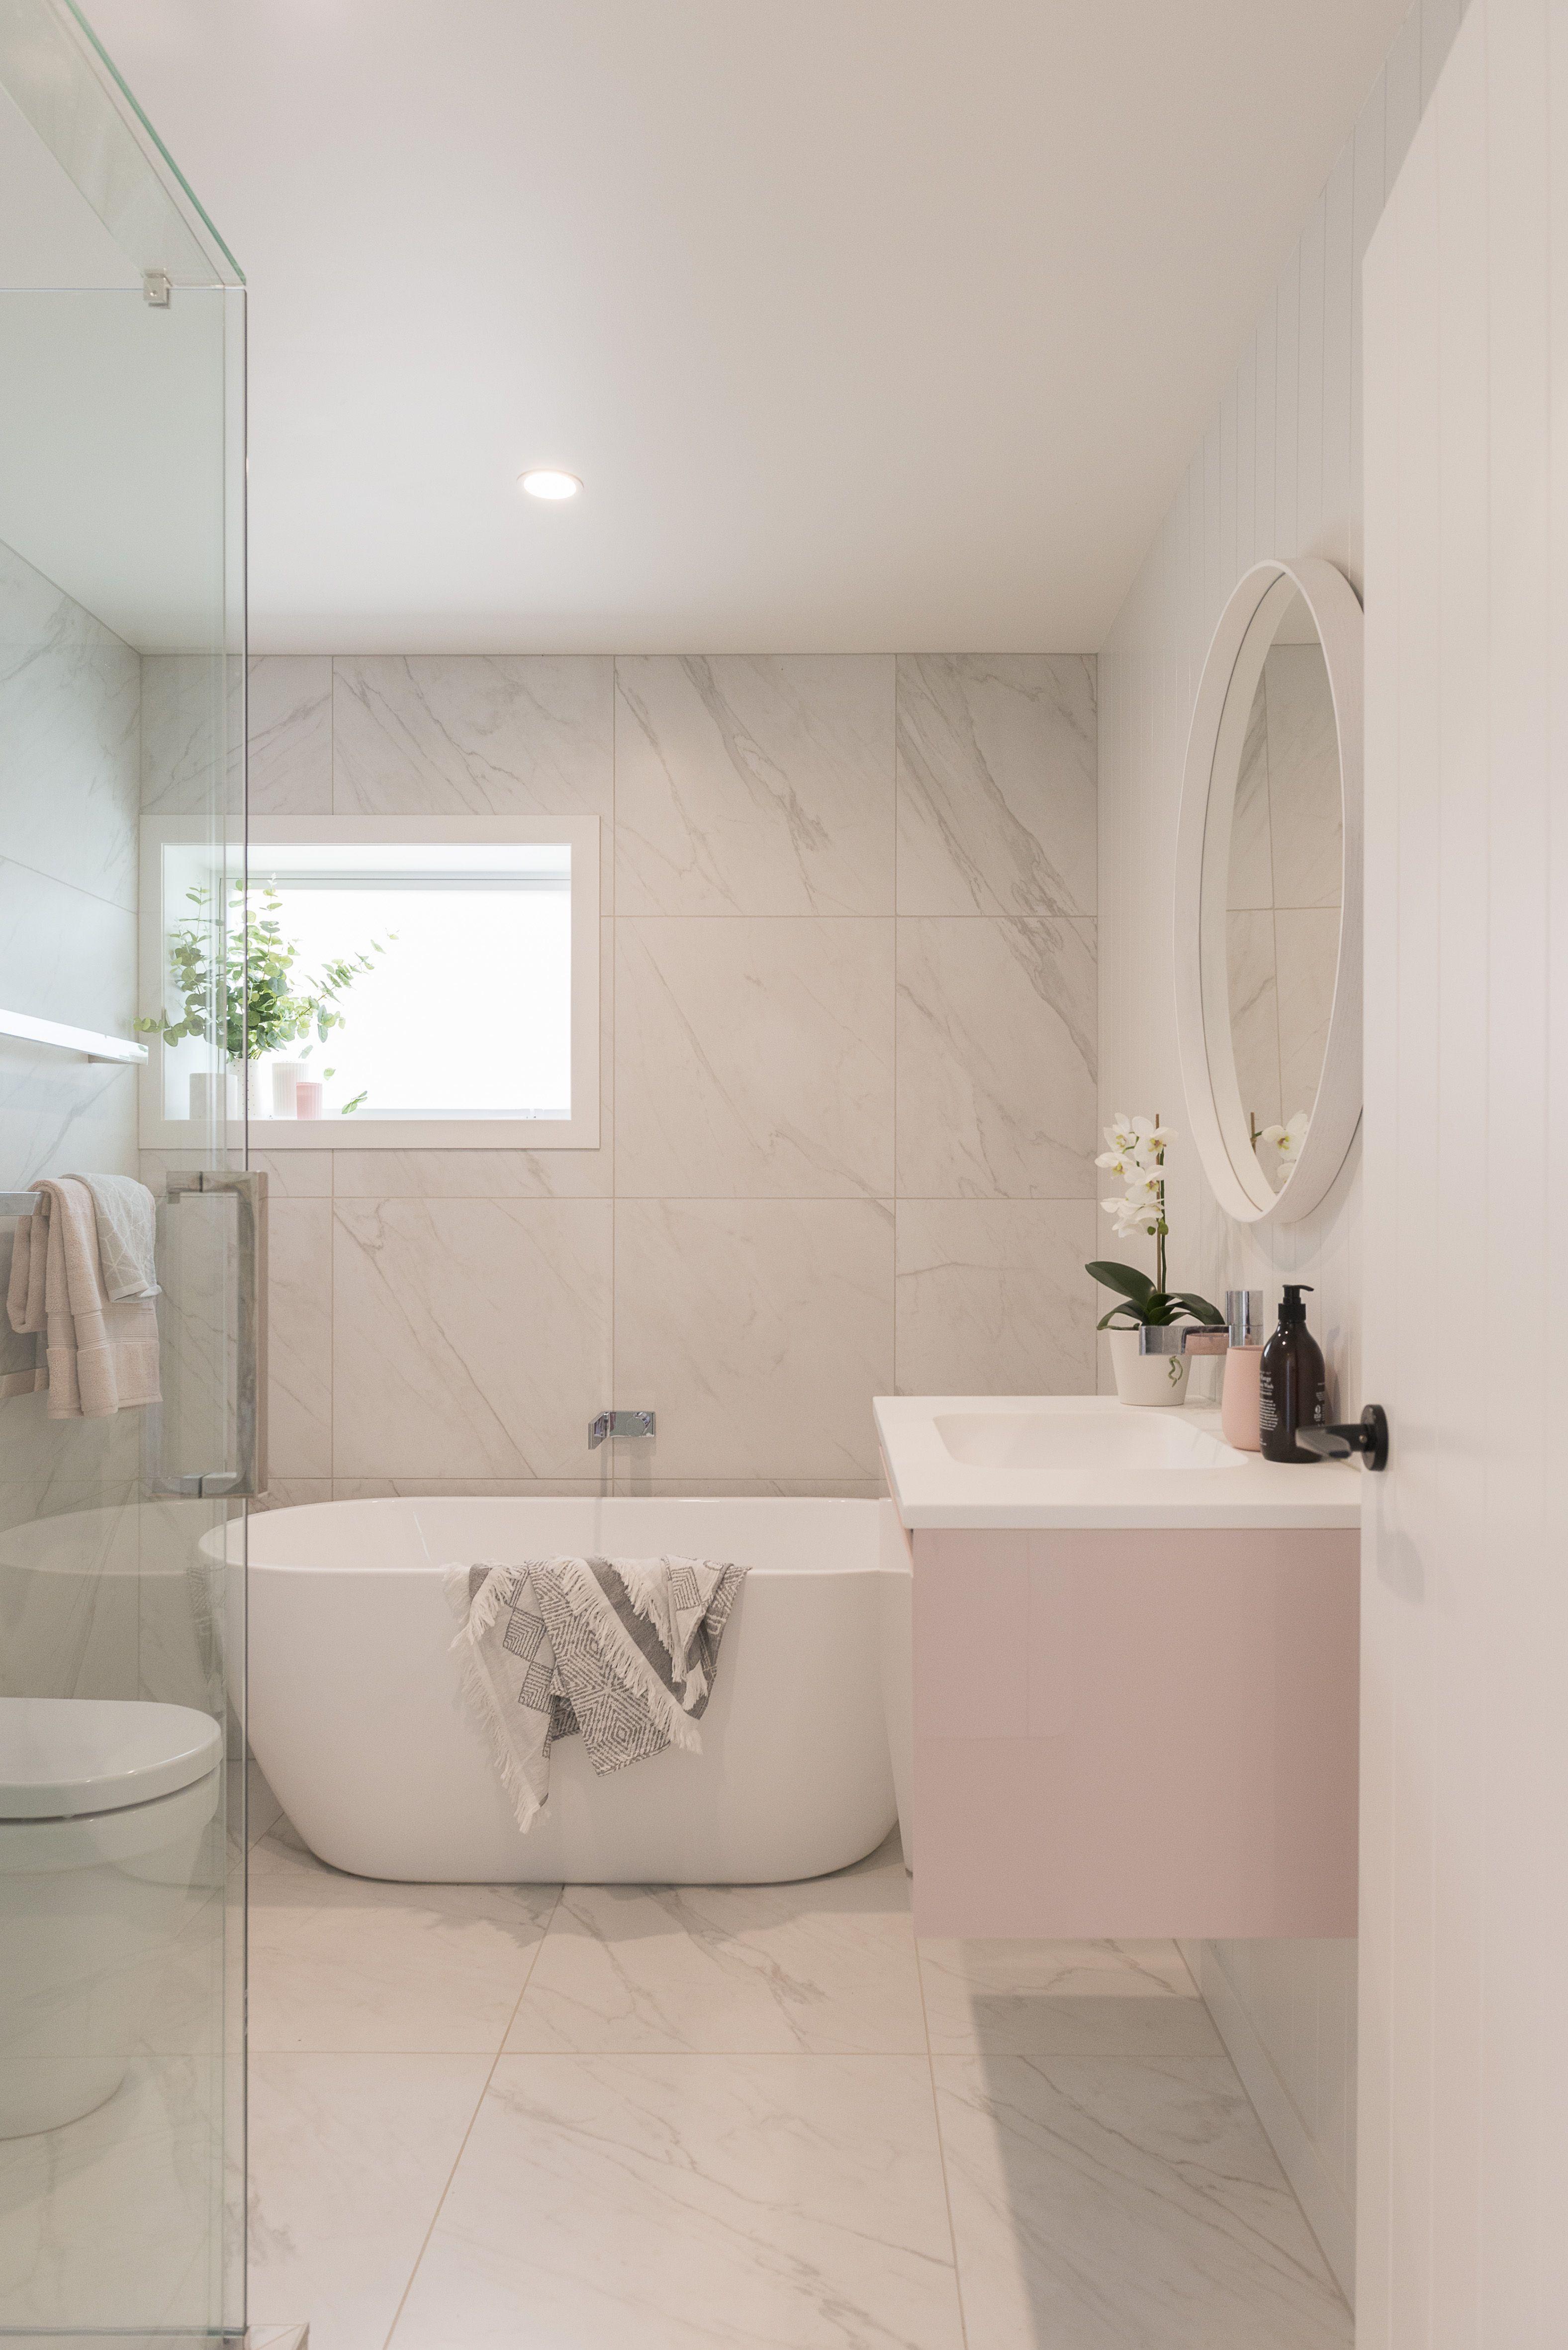 Boy Girl Bathroom Decorating Ideas 2020 Dekorasi Rumah Masa Depan